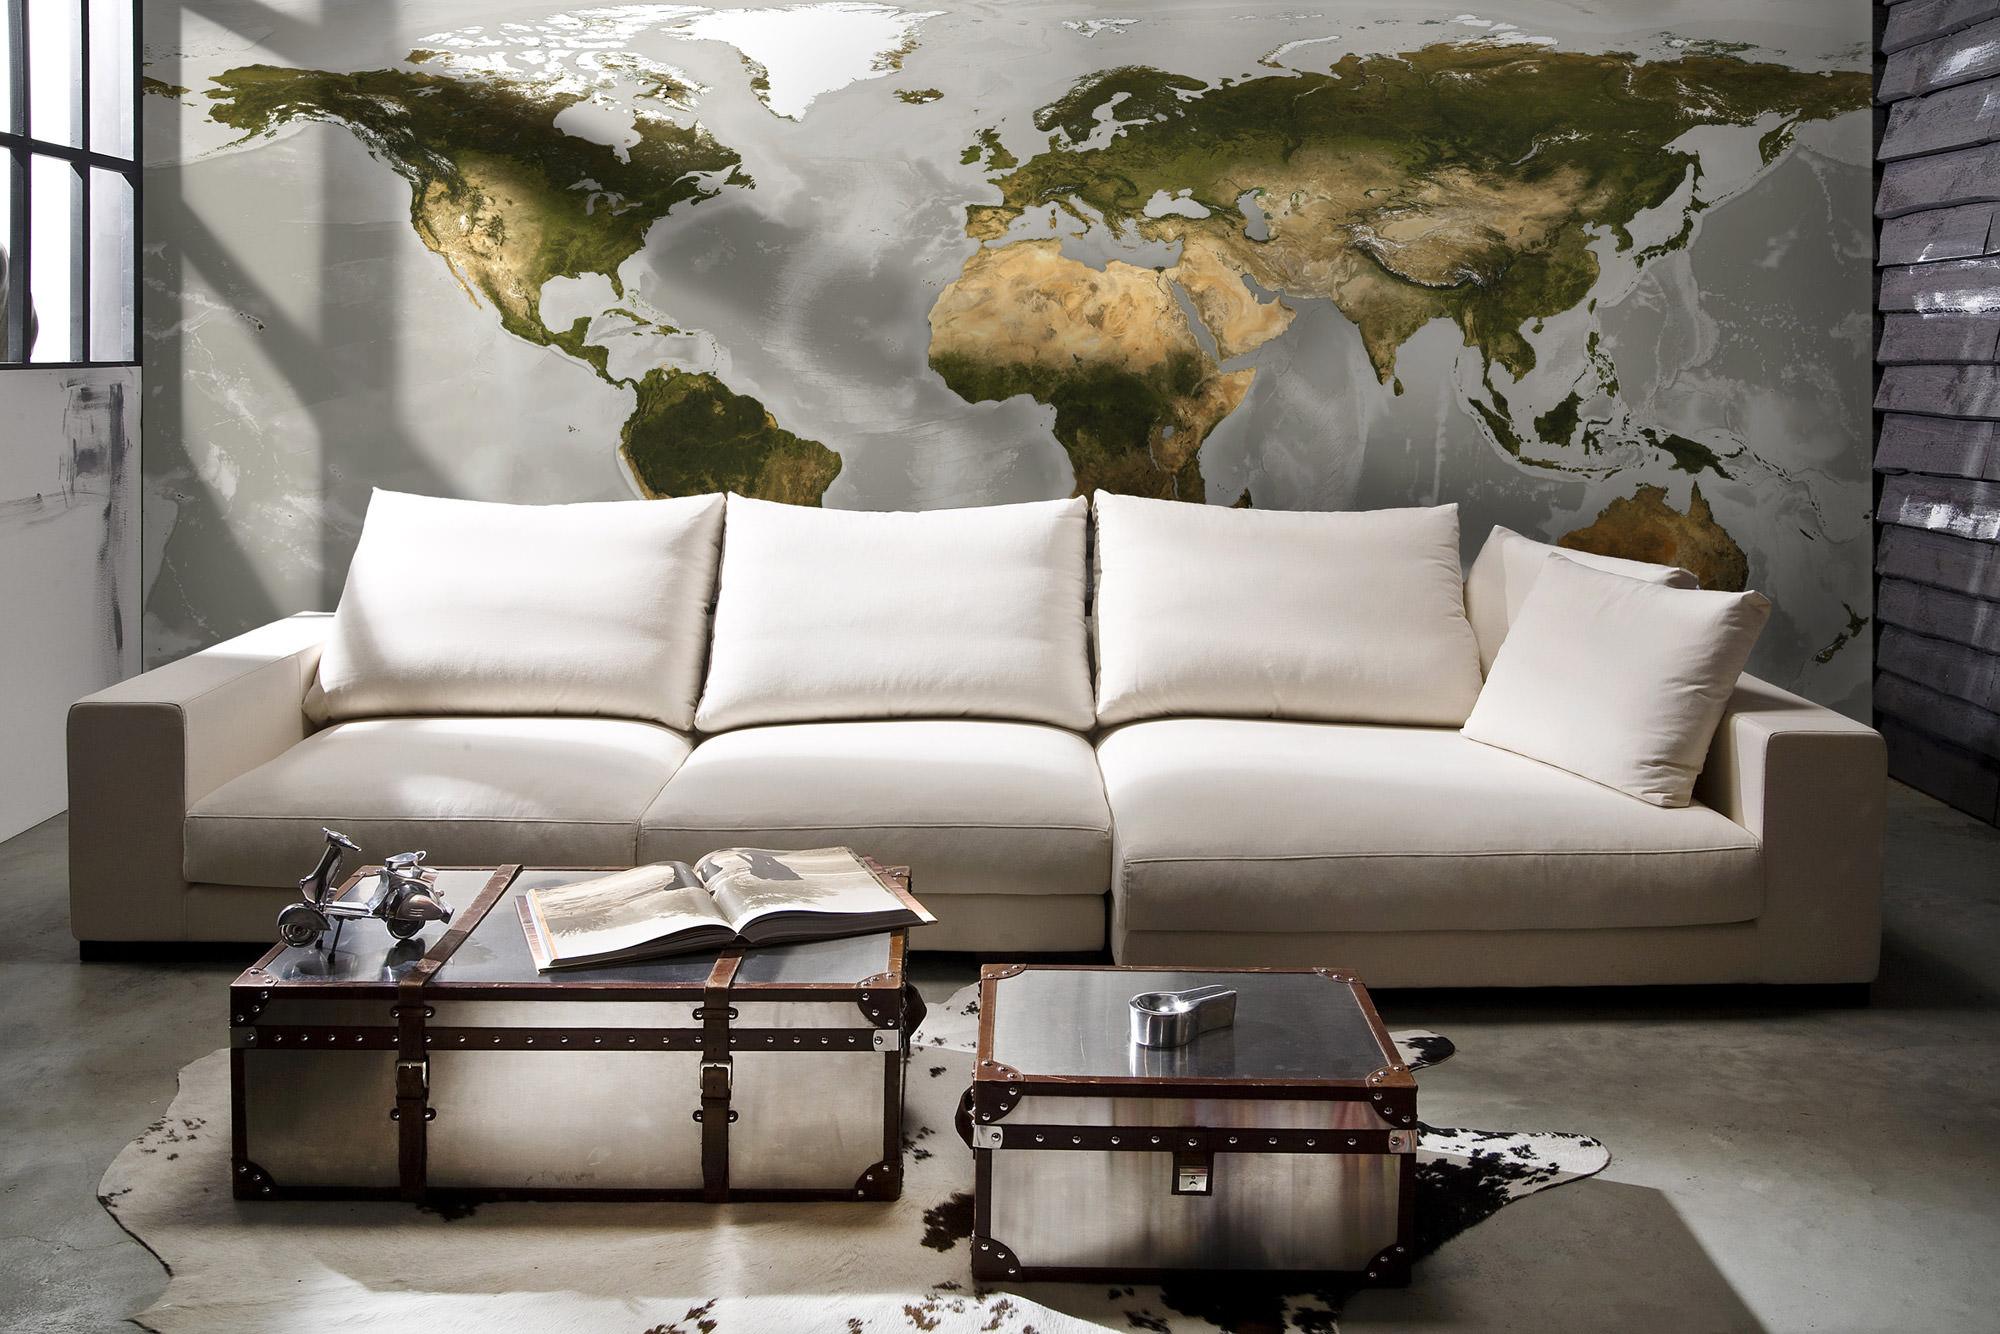 fototapete vlies world weltkarte xxl sunnywall online shop. Black Bedroom Furniture Sets. Home Design Ideas